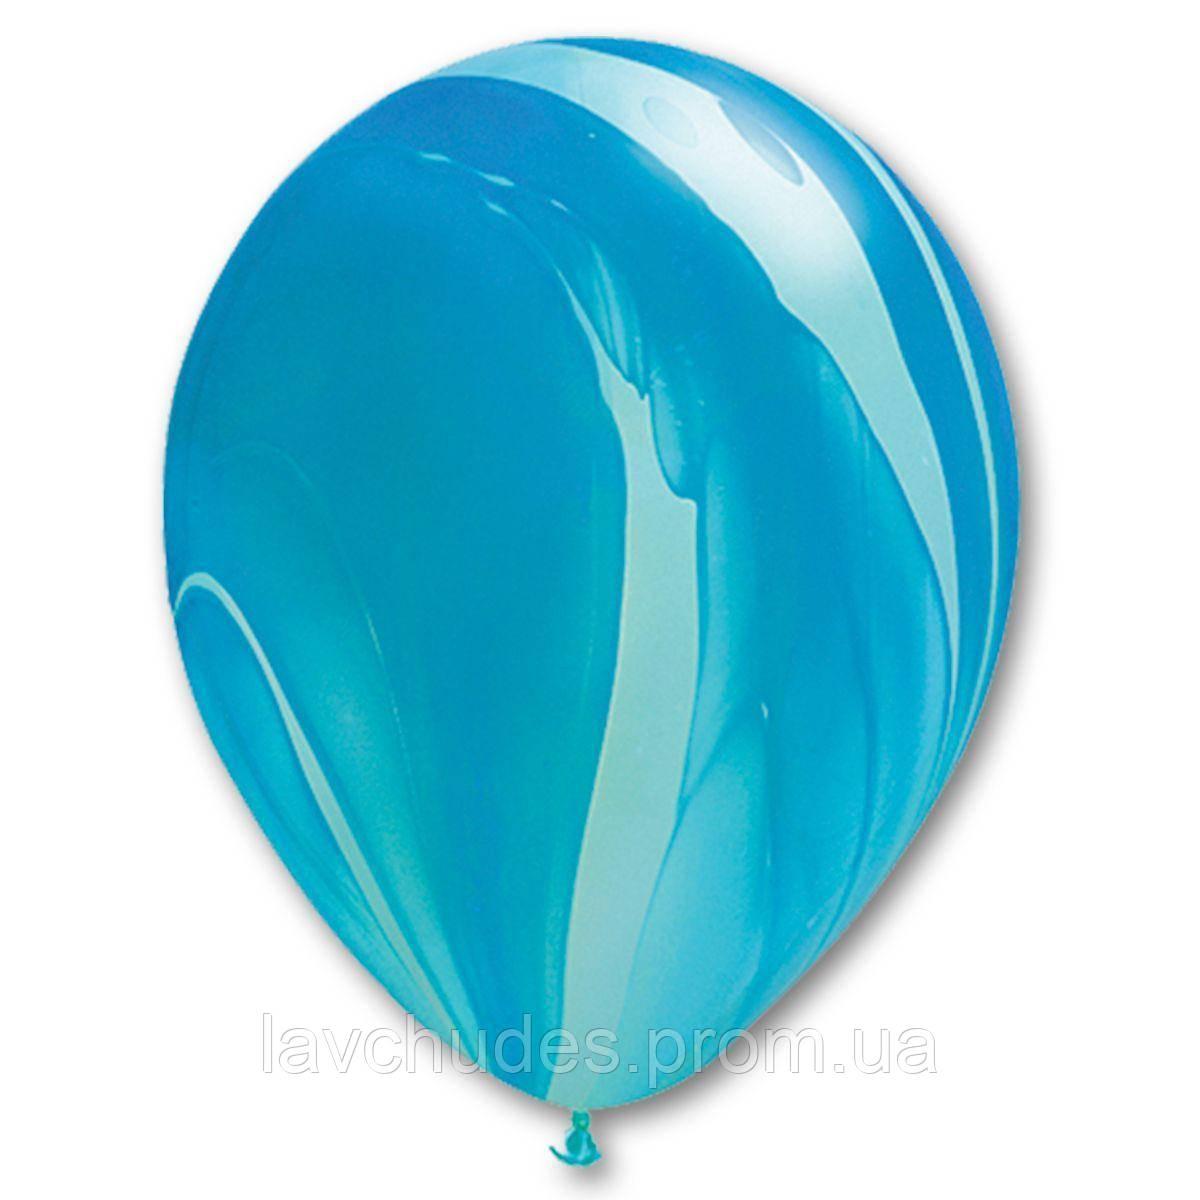 Гелиевые шары Агат - супер агат голубой.  Гелиевые шары Киев. Гелиевые шары с доставкой по Киеву.